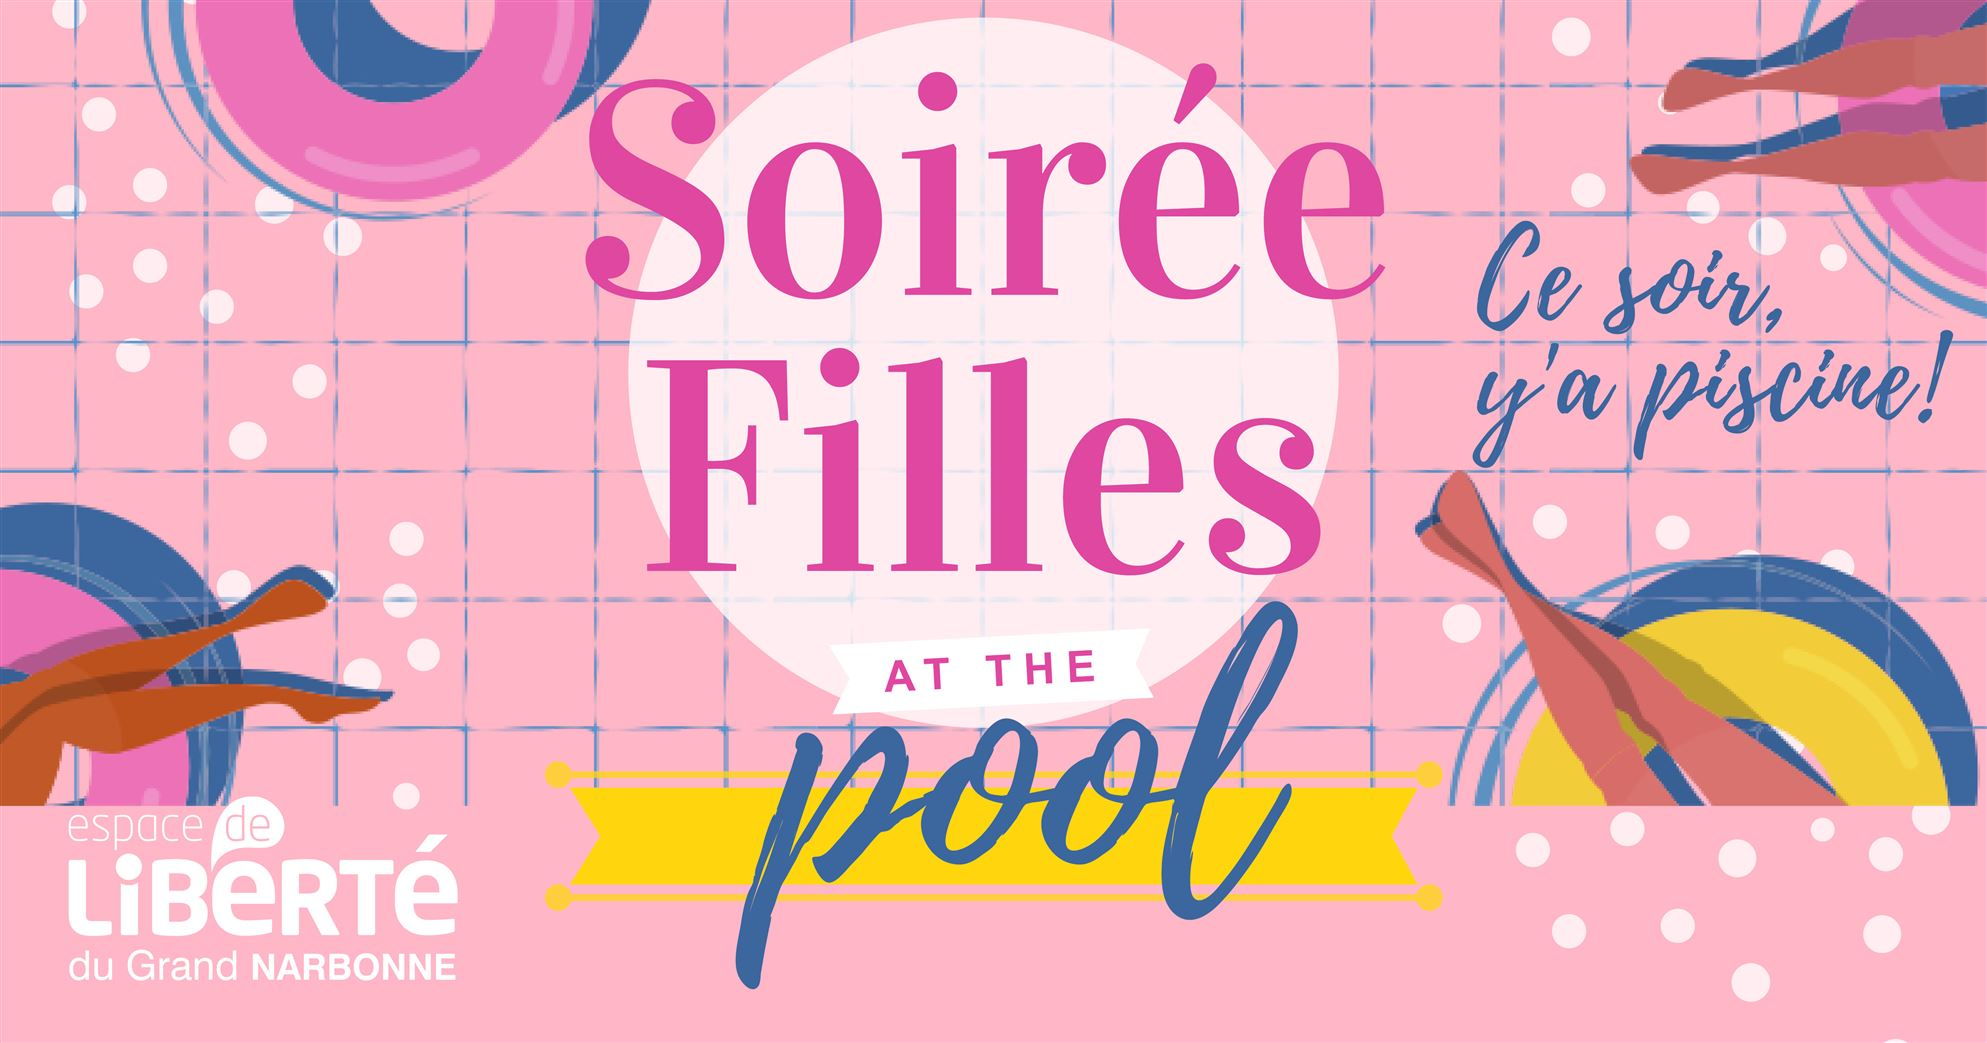 SOIRÉE FILLES at the pool